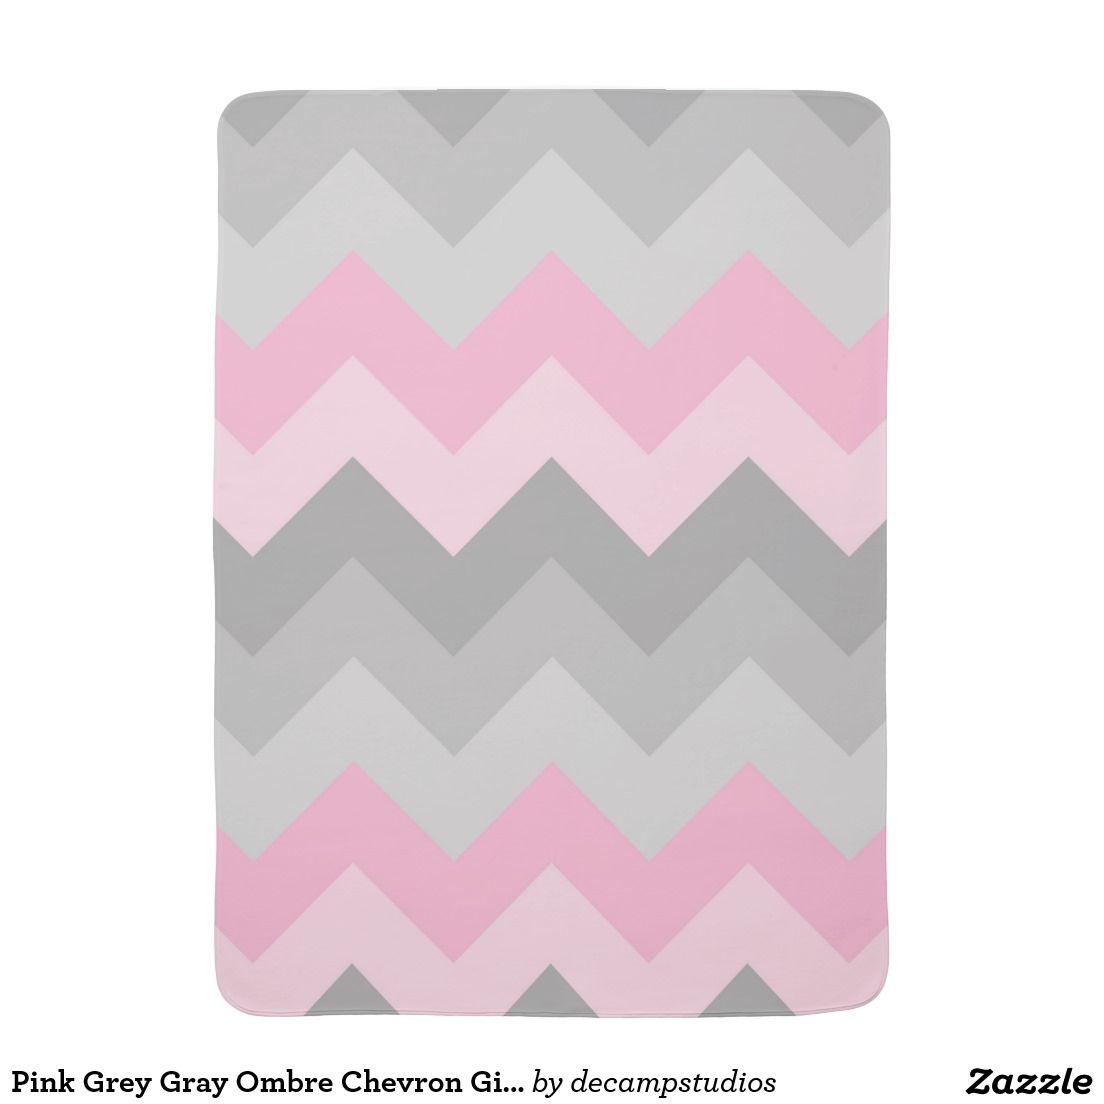 Pink Grey Gray Ombre Chevron Baby Girl Nursery Stroller Blanket